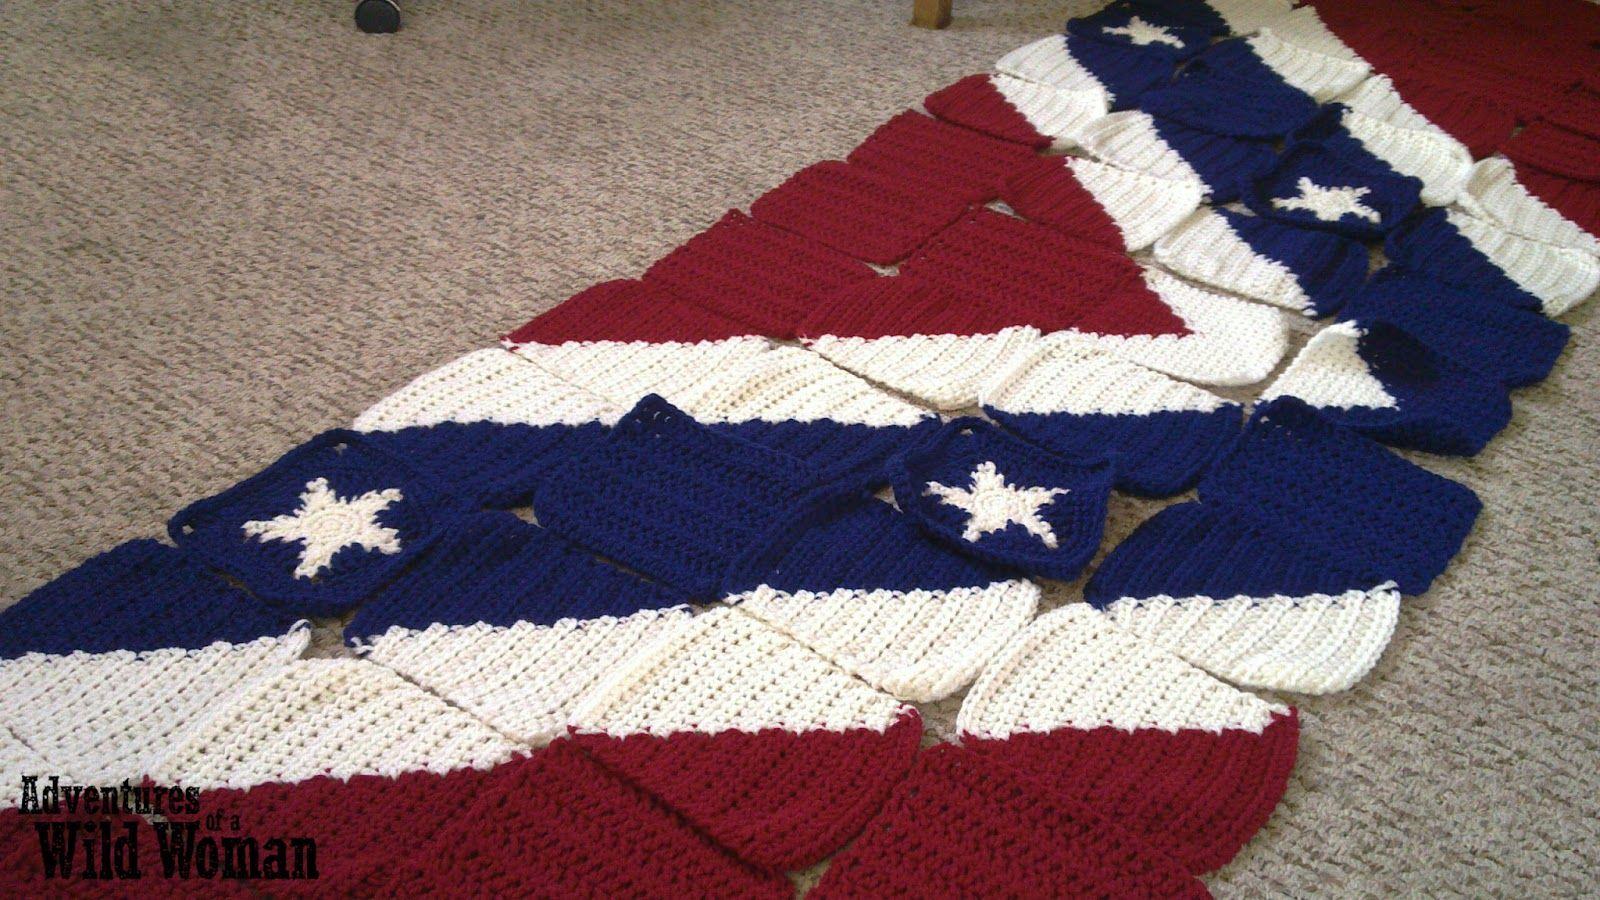 Adventures of a wild woman crochet confederate flag blanket adventures of a wild woman crochet confederate flag blanket bankloansurffo Images